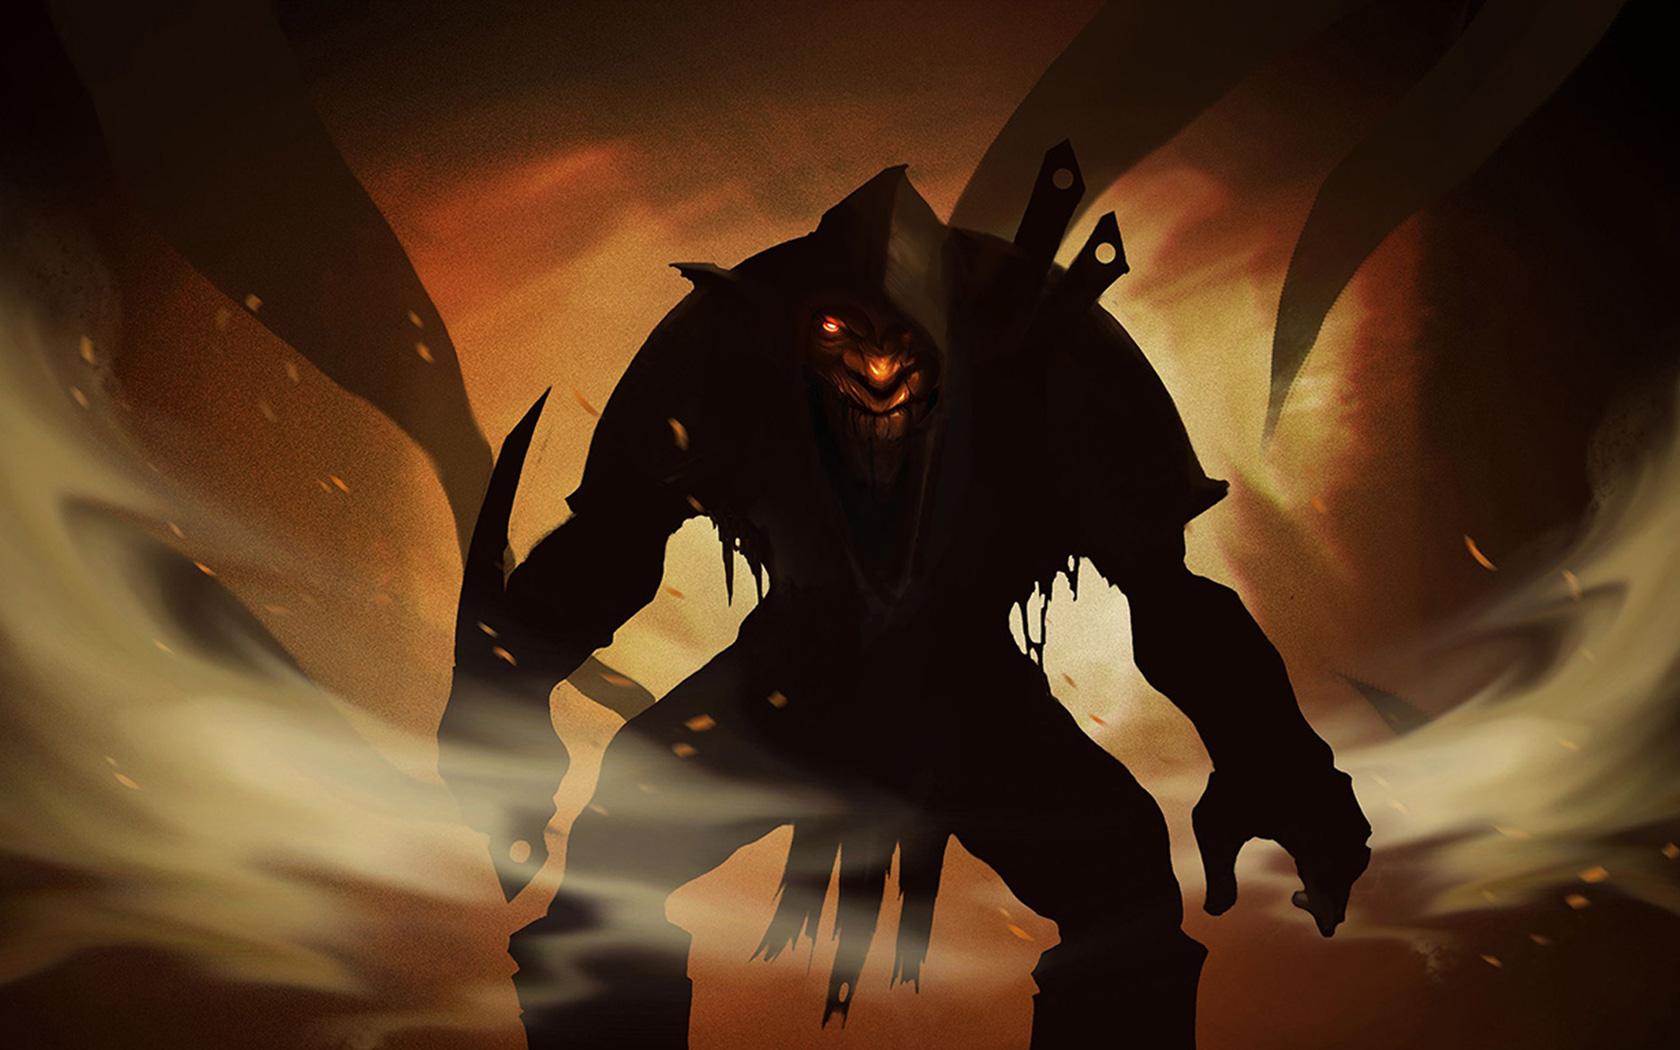 Styx Master of Shadows Wallpaper in 1680x1050 1680x1050